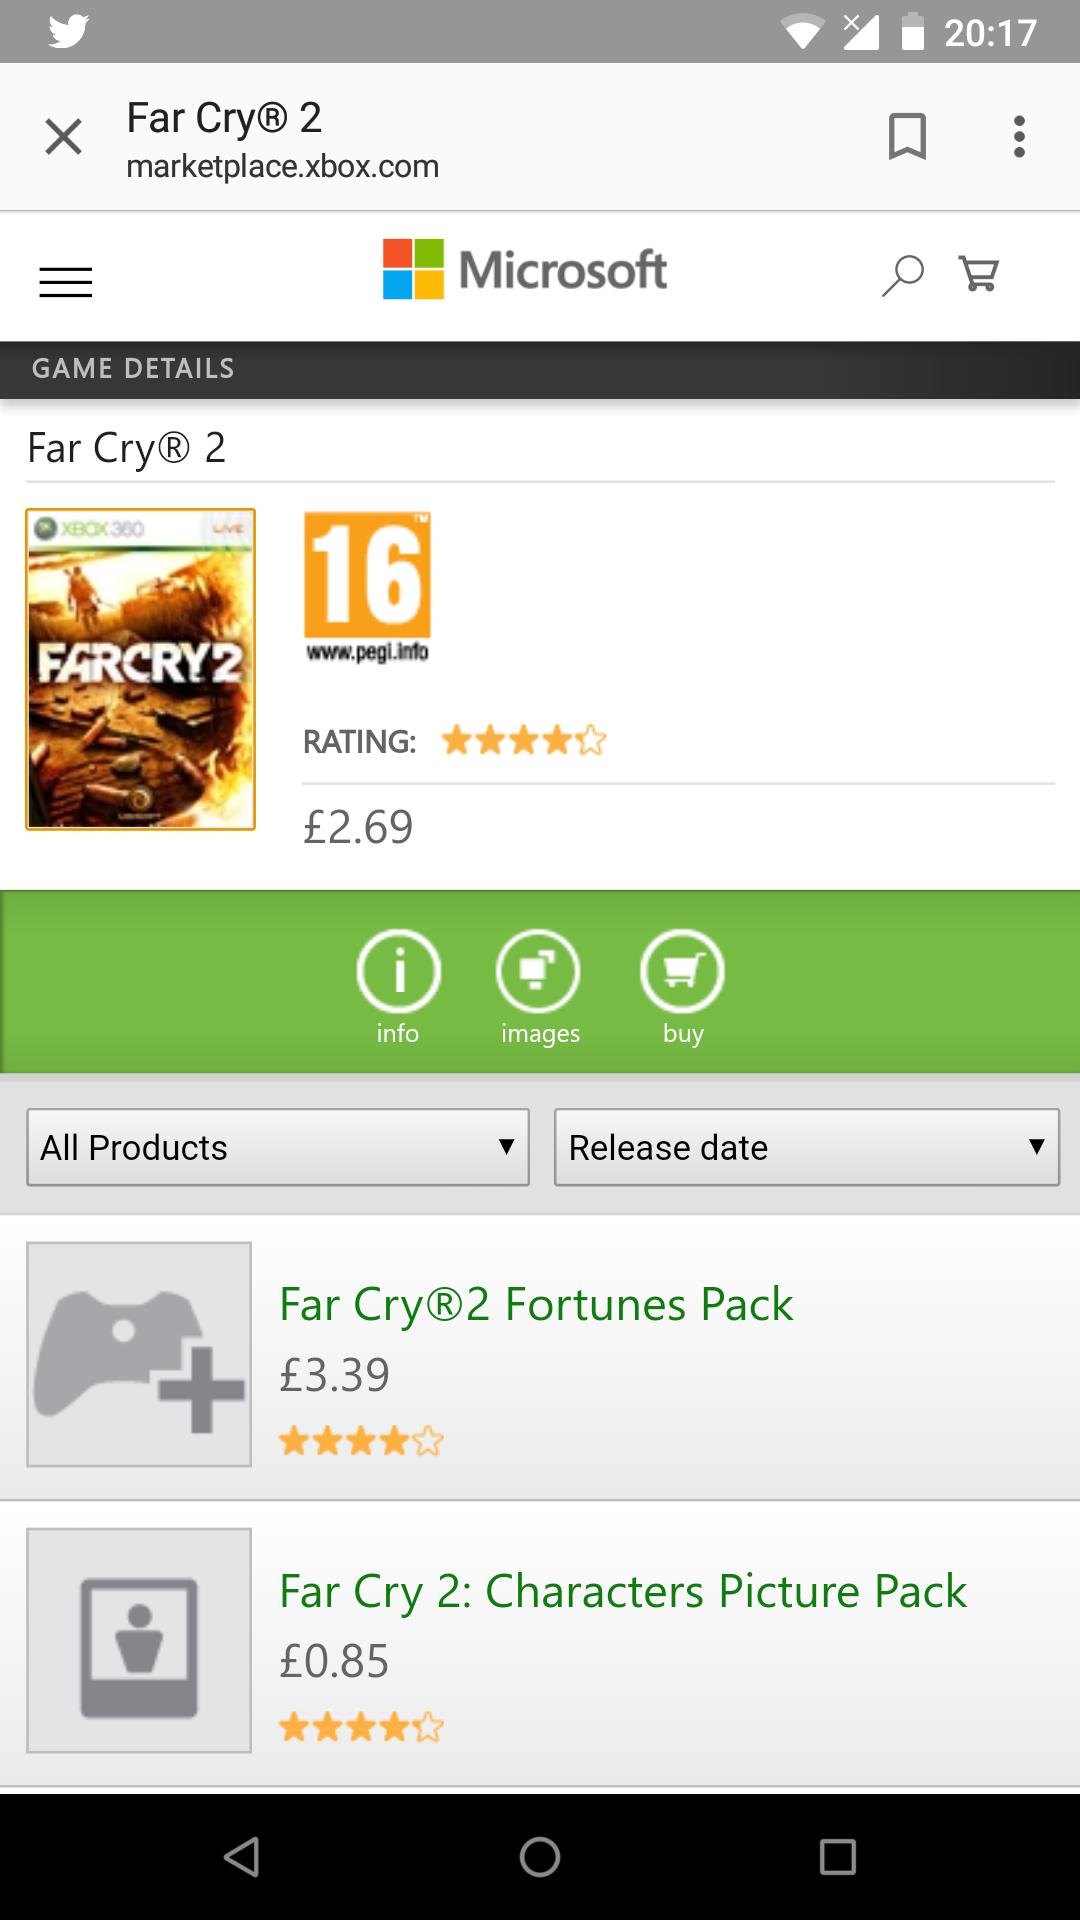 Xbox 360 - Far Cry 2 - £2.69 @ Xbox Marketplace